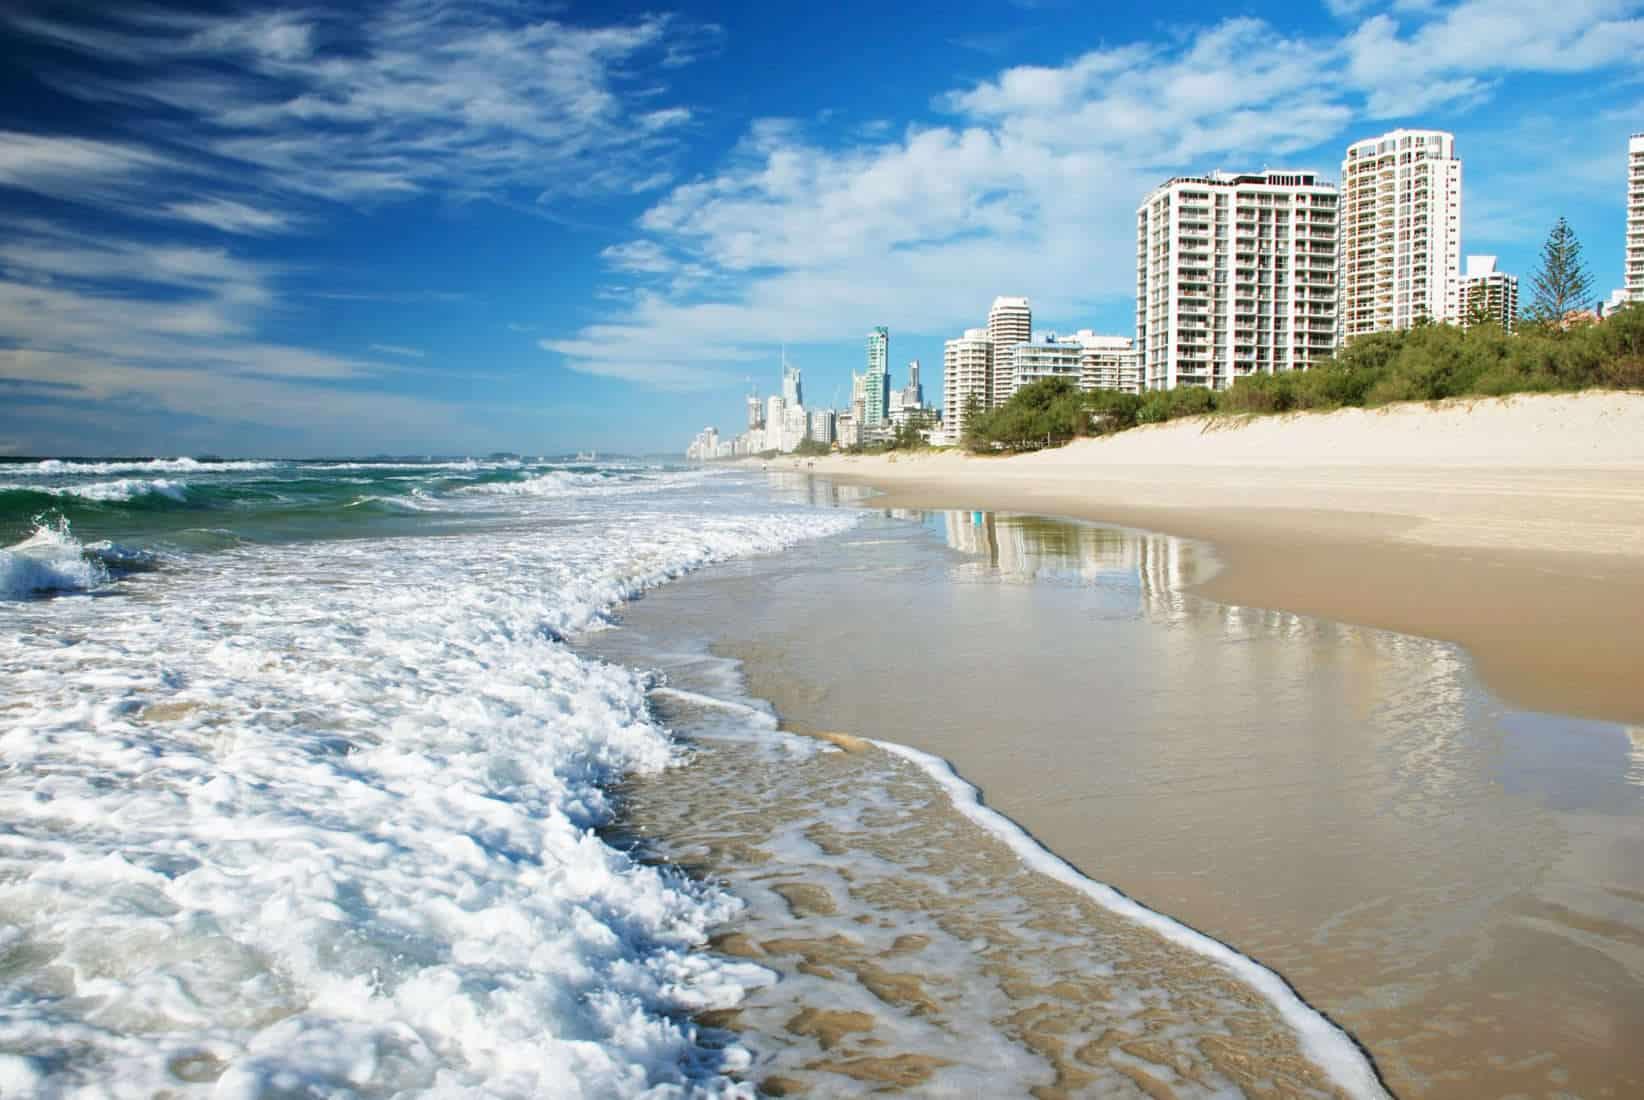 Surfers paradise beach, Goldcoast, Australia